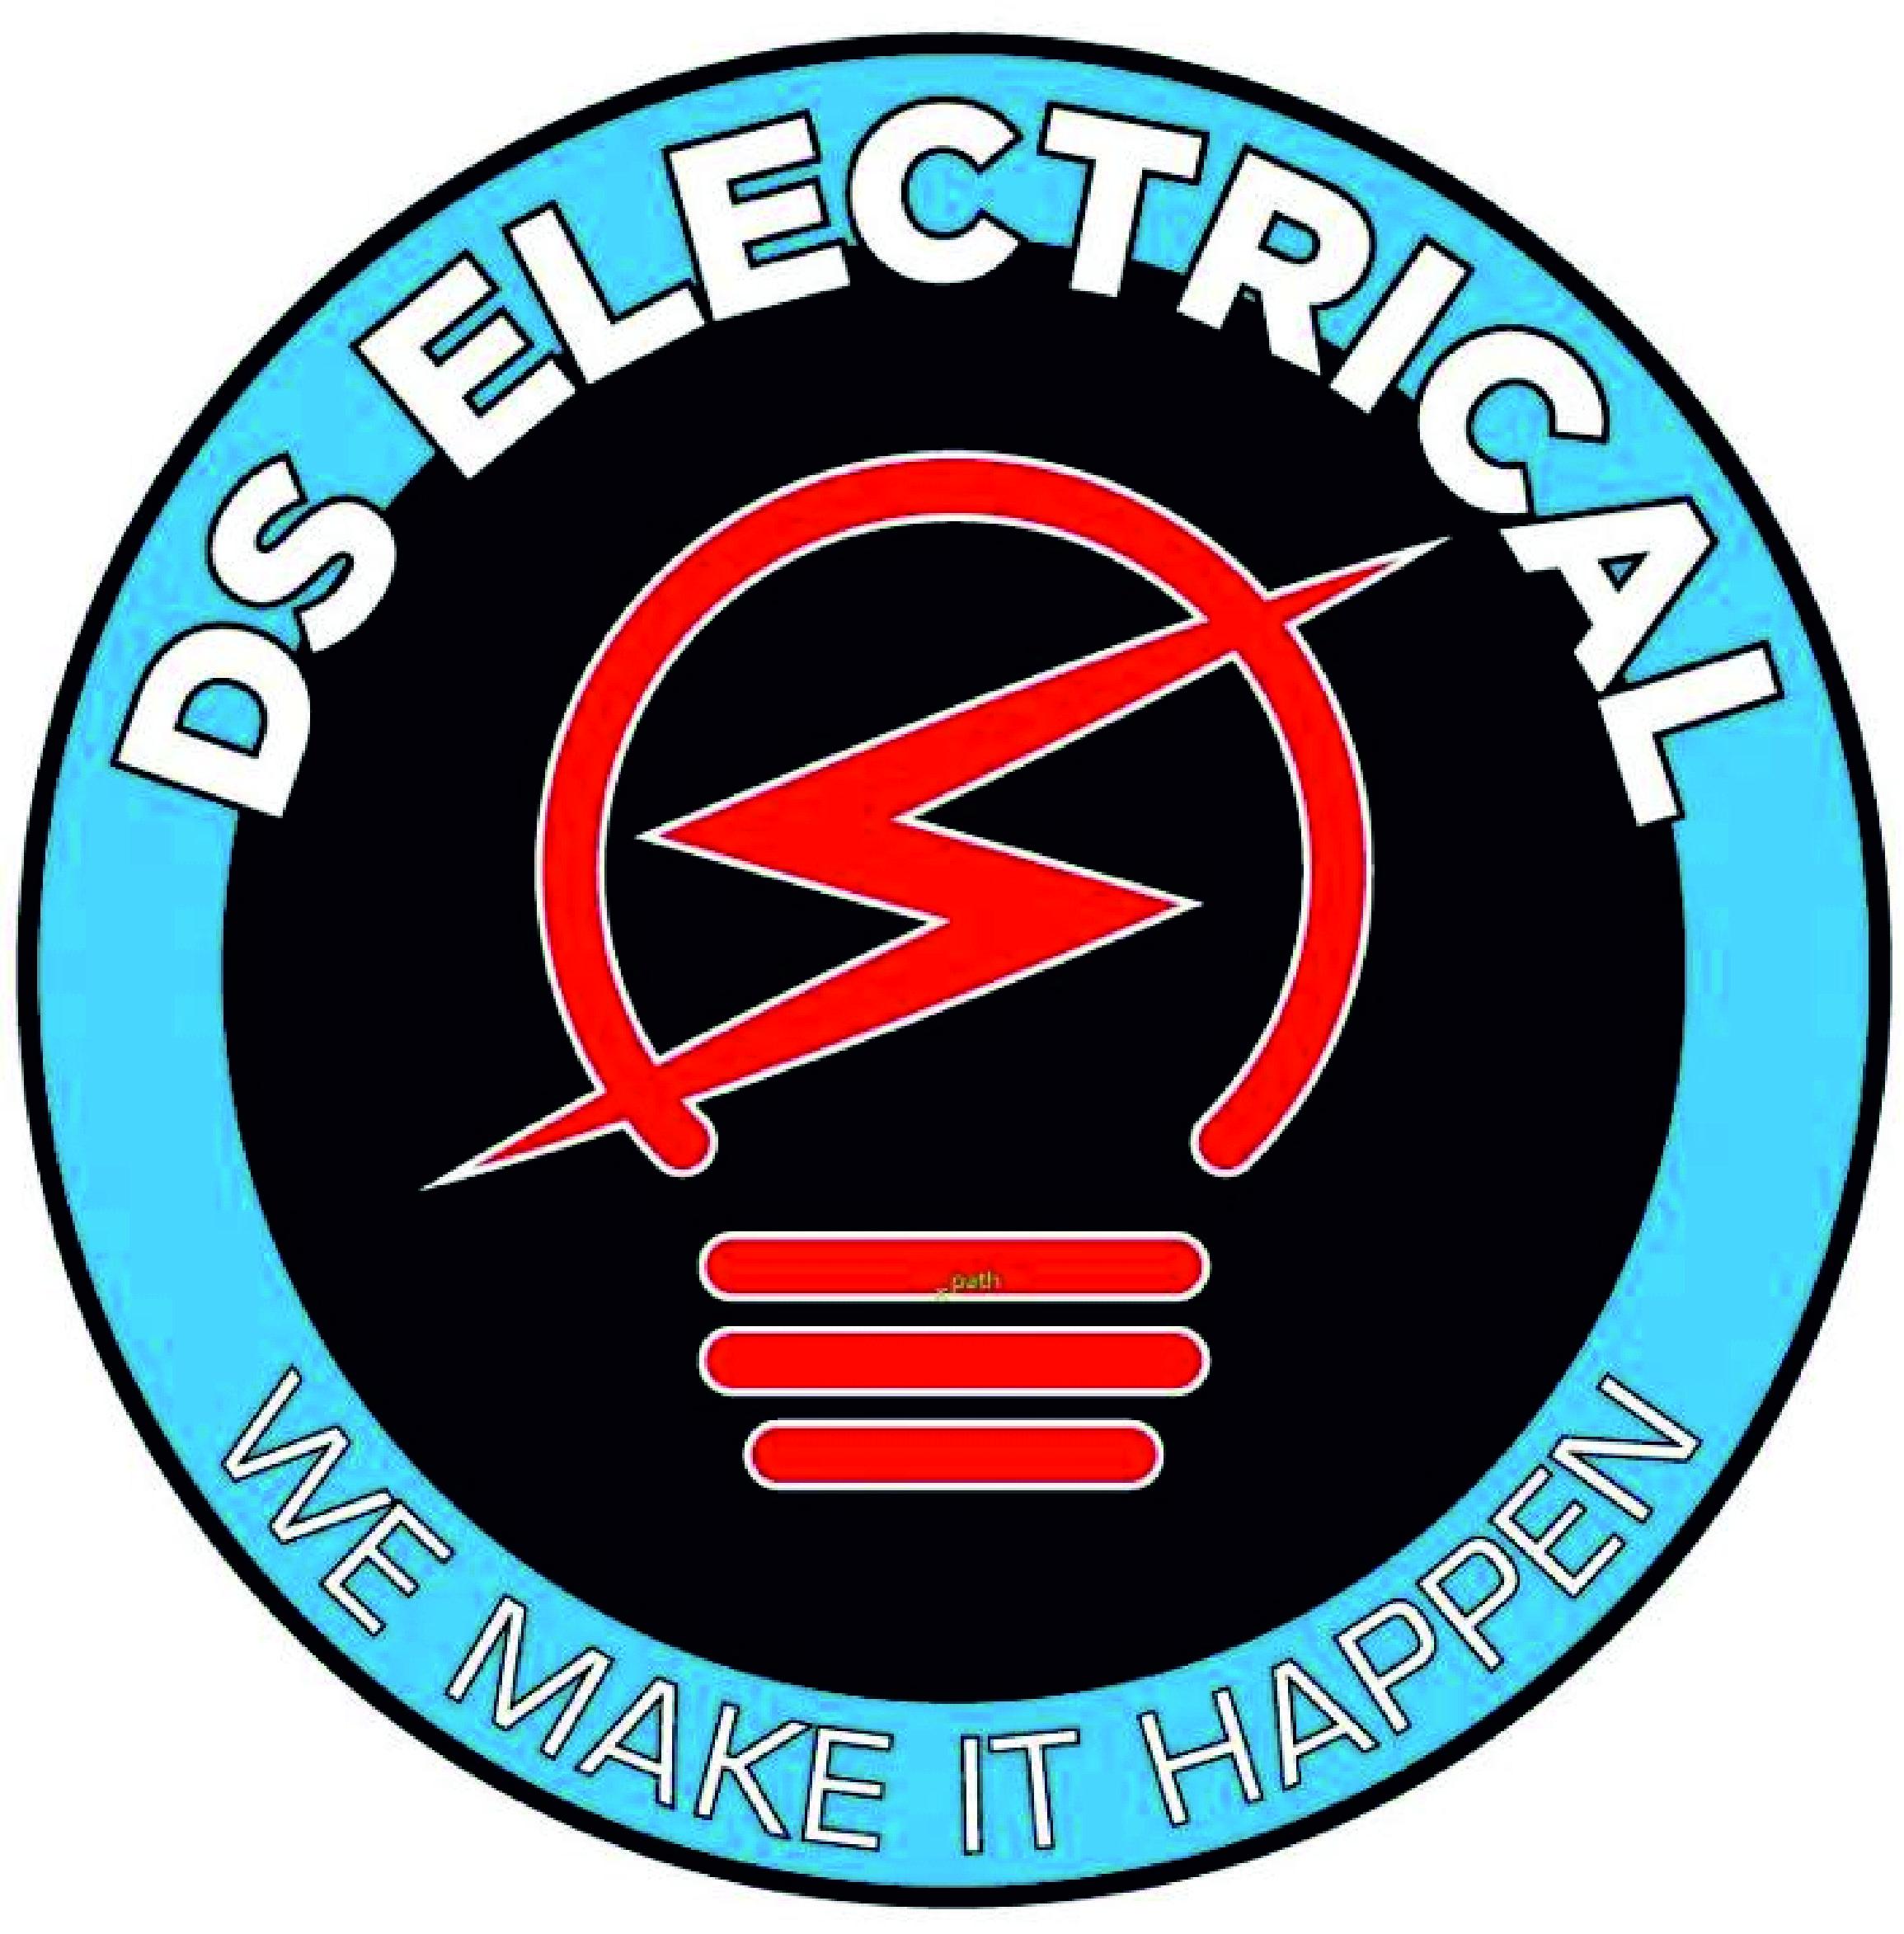 Daniel Swain - D S Electical